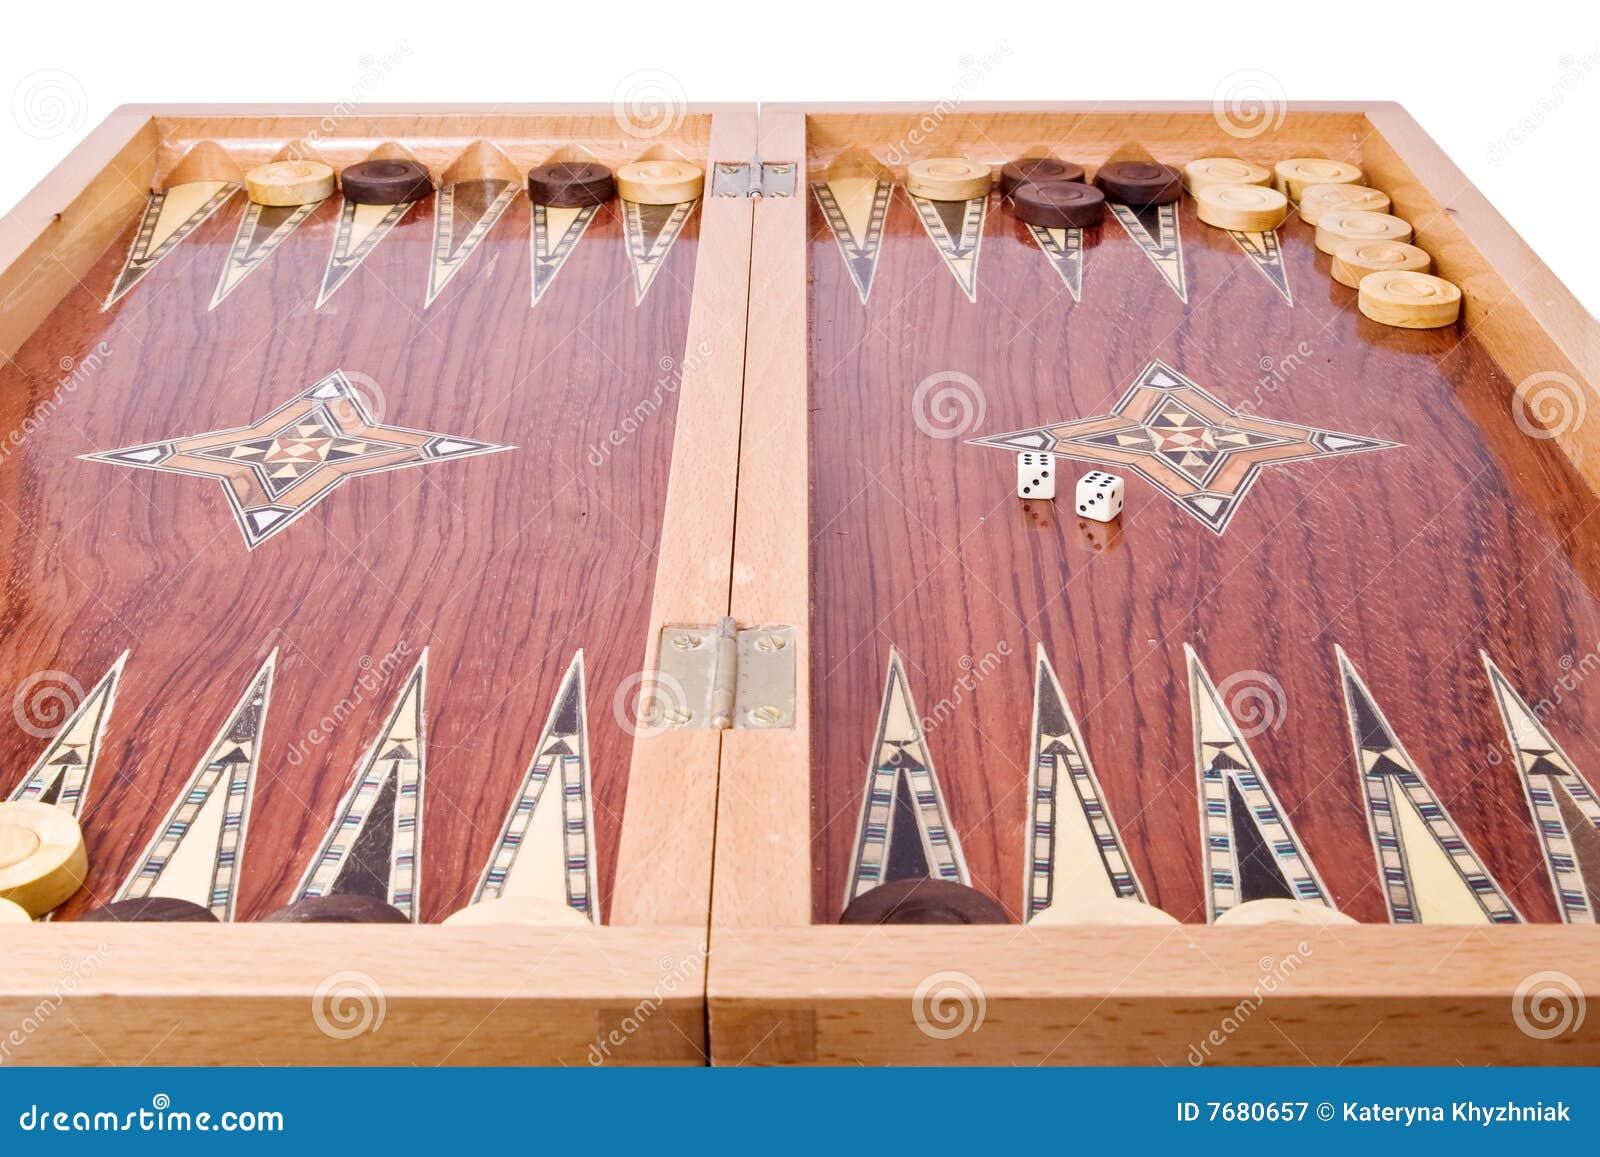 Backgammon online Spinit - 487827